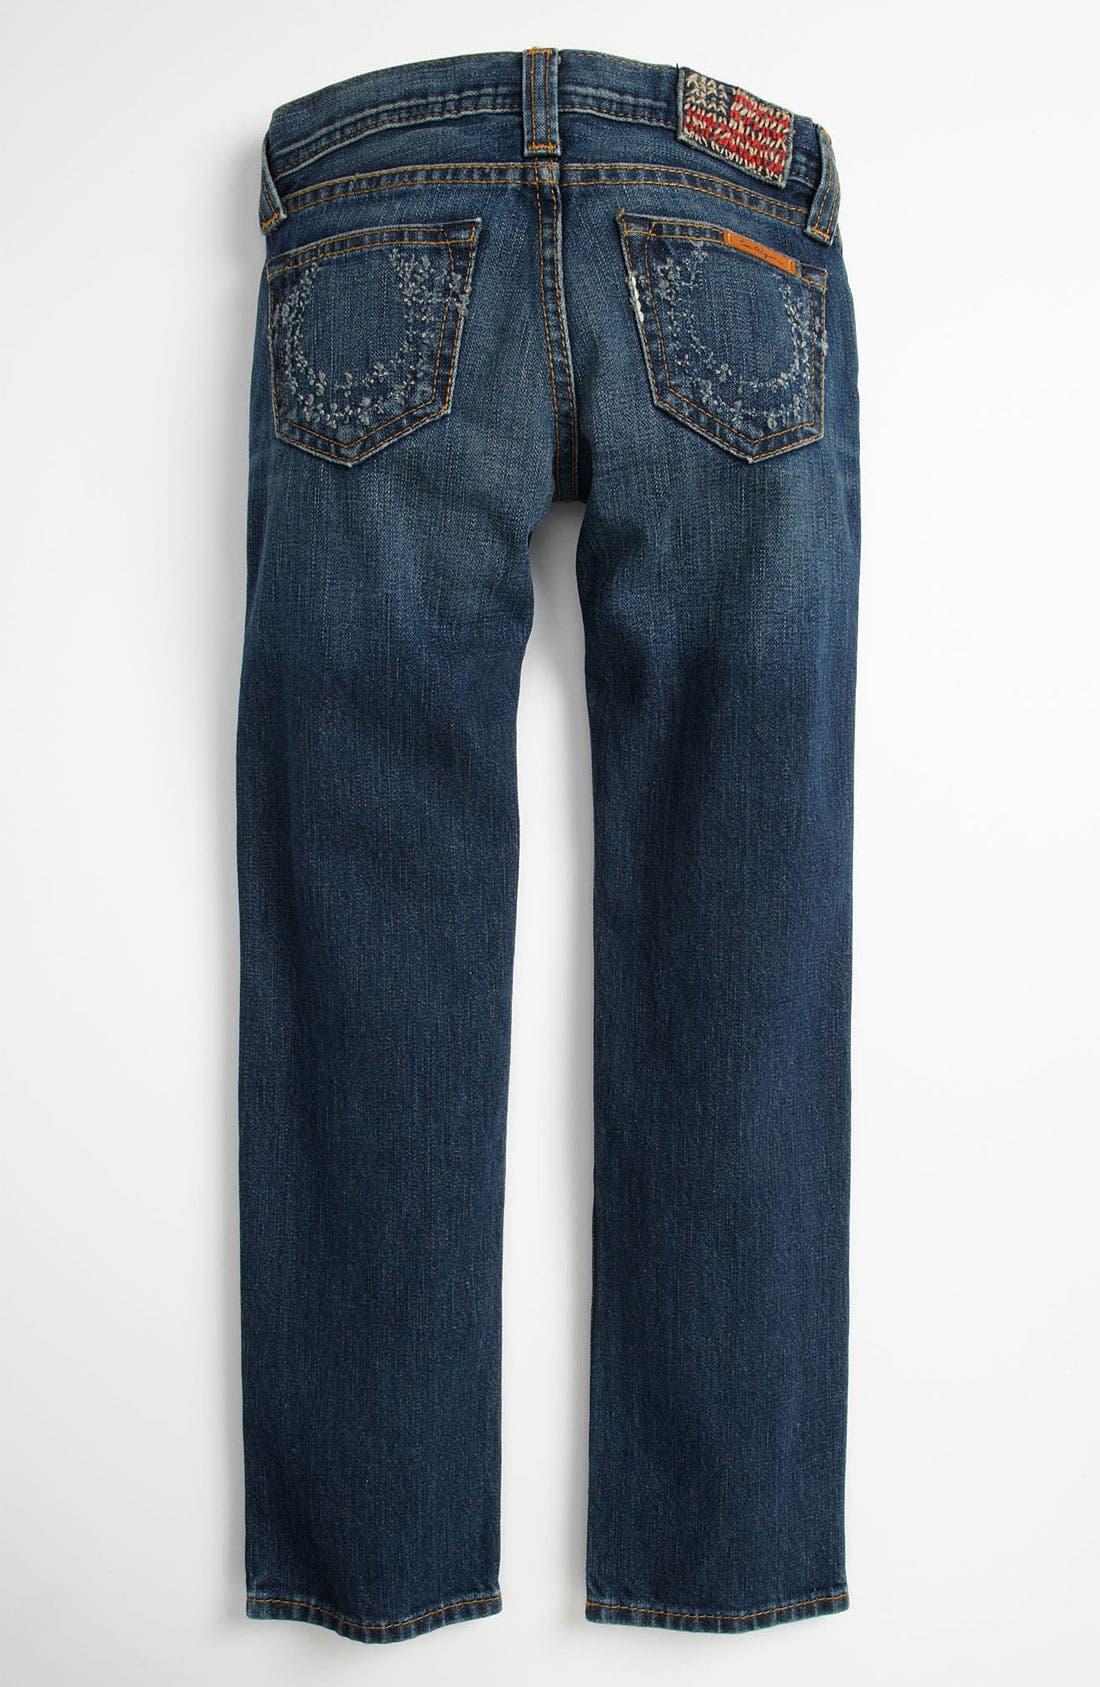 Main Image - True Religion Brand Jeans 'Rocco Phantom' Skinny Jeans (Big Boys)